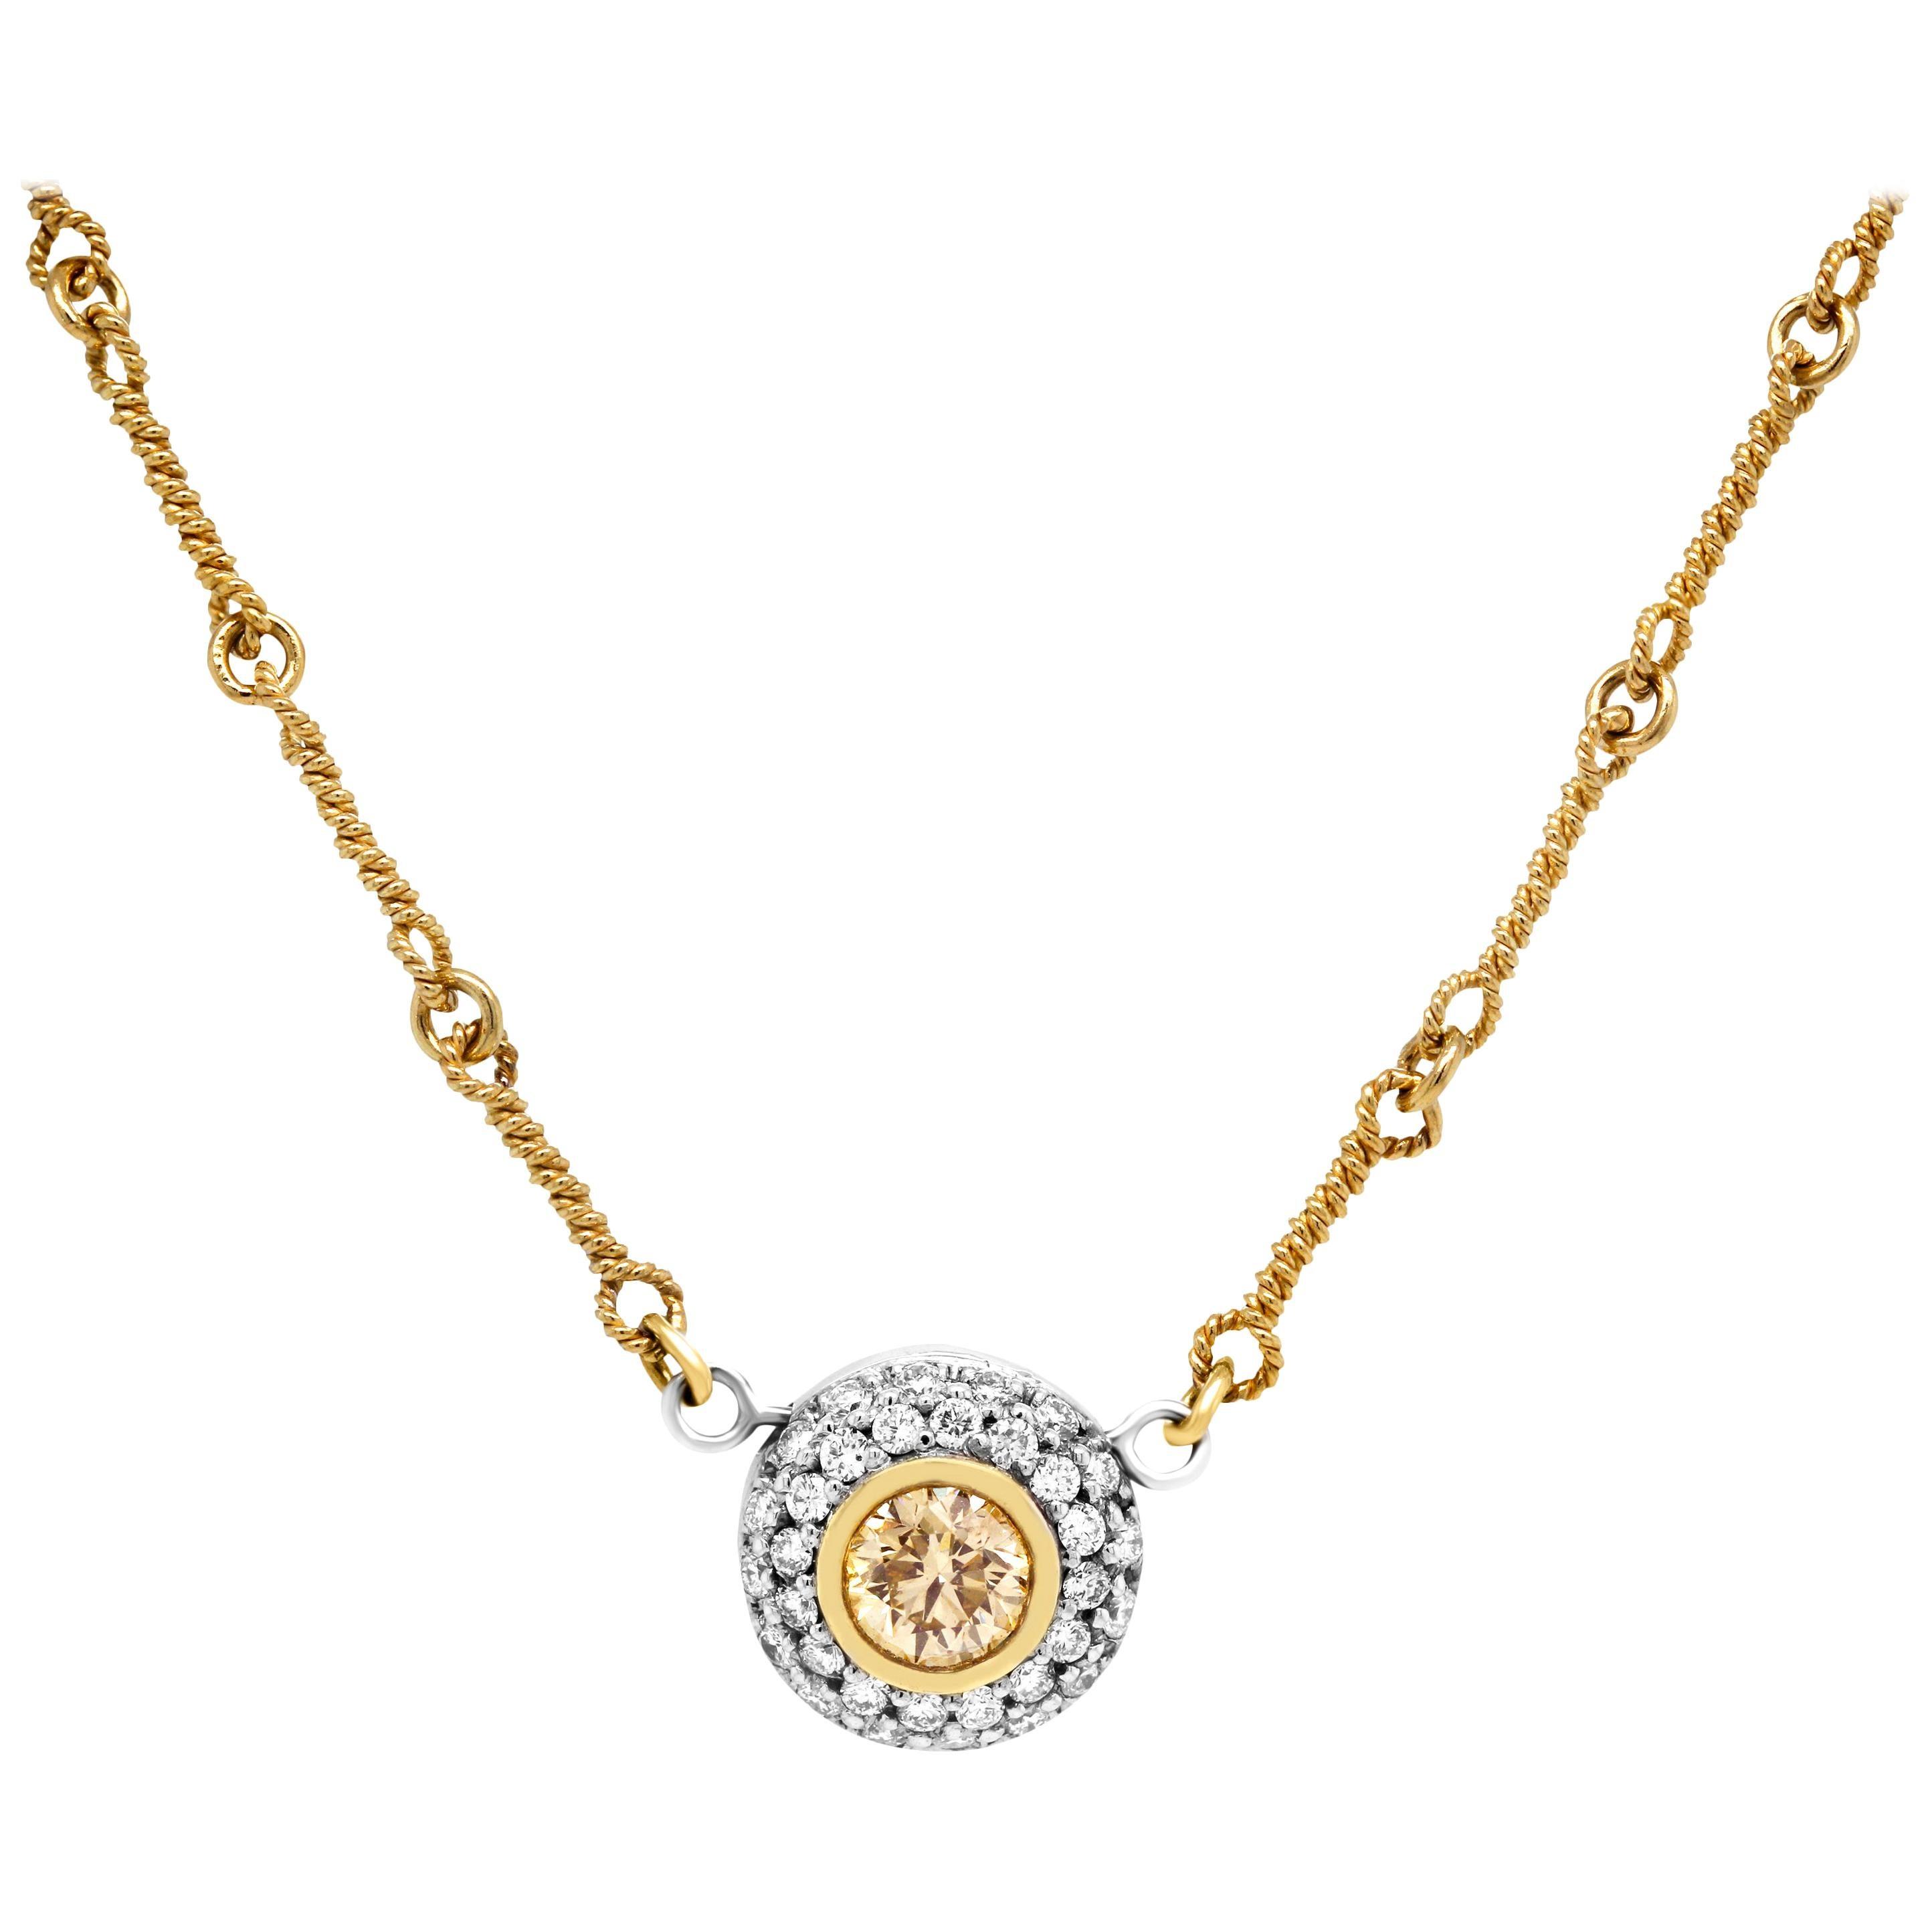 Stambolian 18 Karat Gold Yellow White Diamond Circle Pendant Chain Necklace